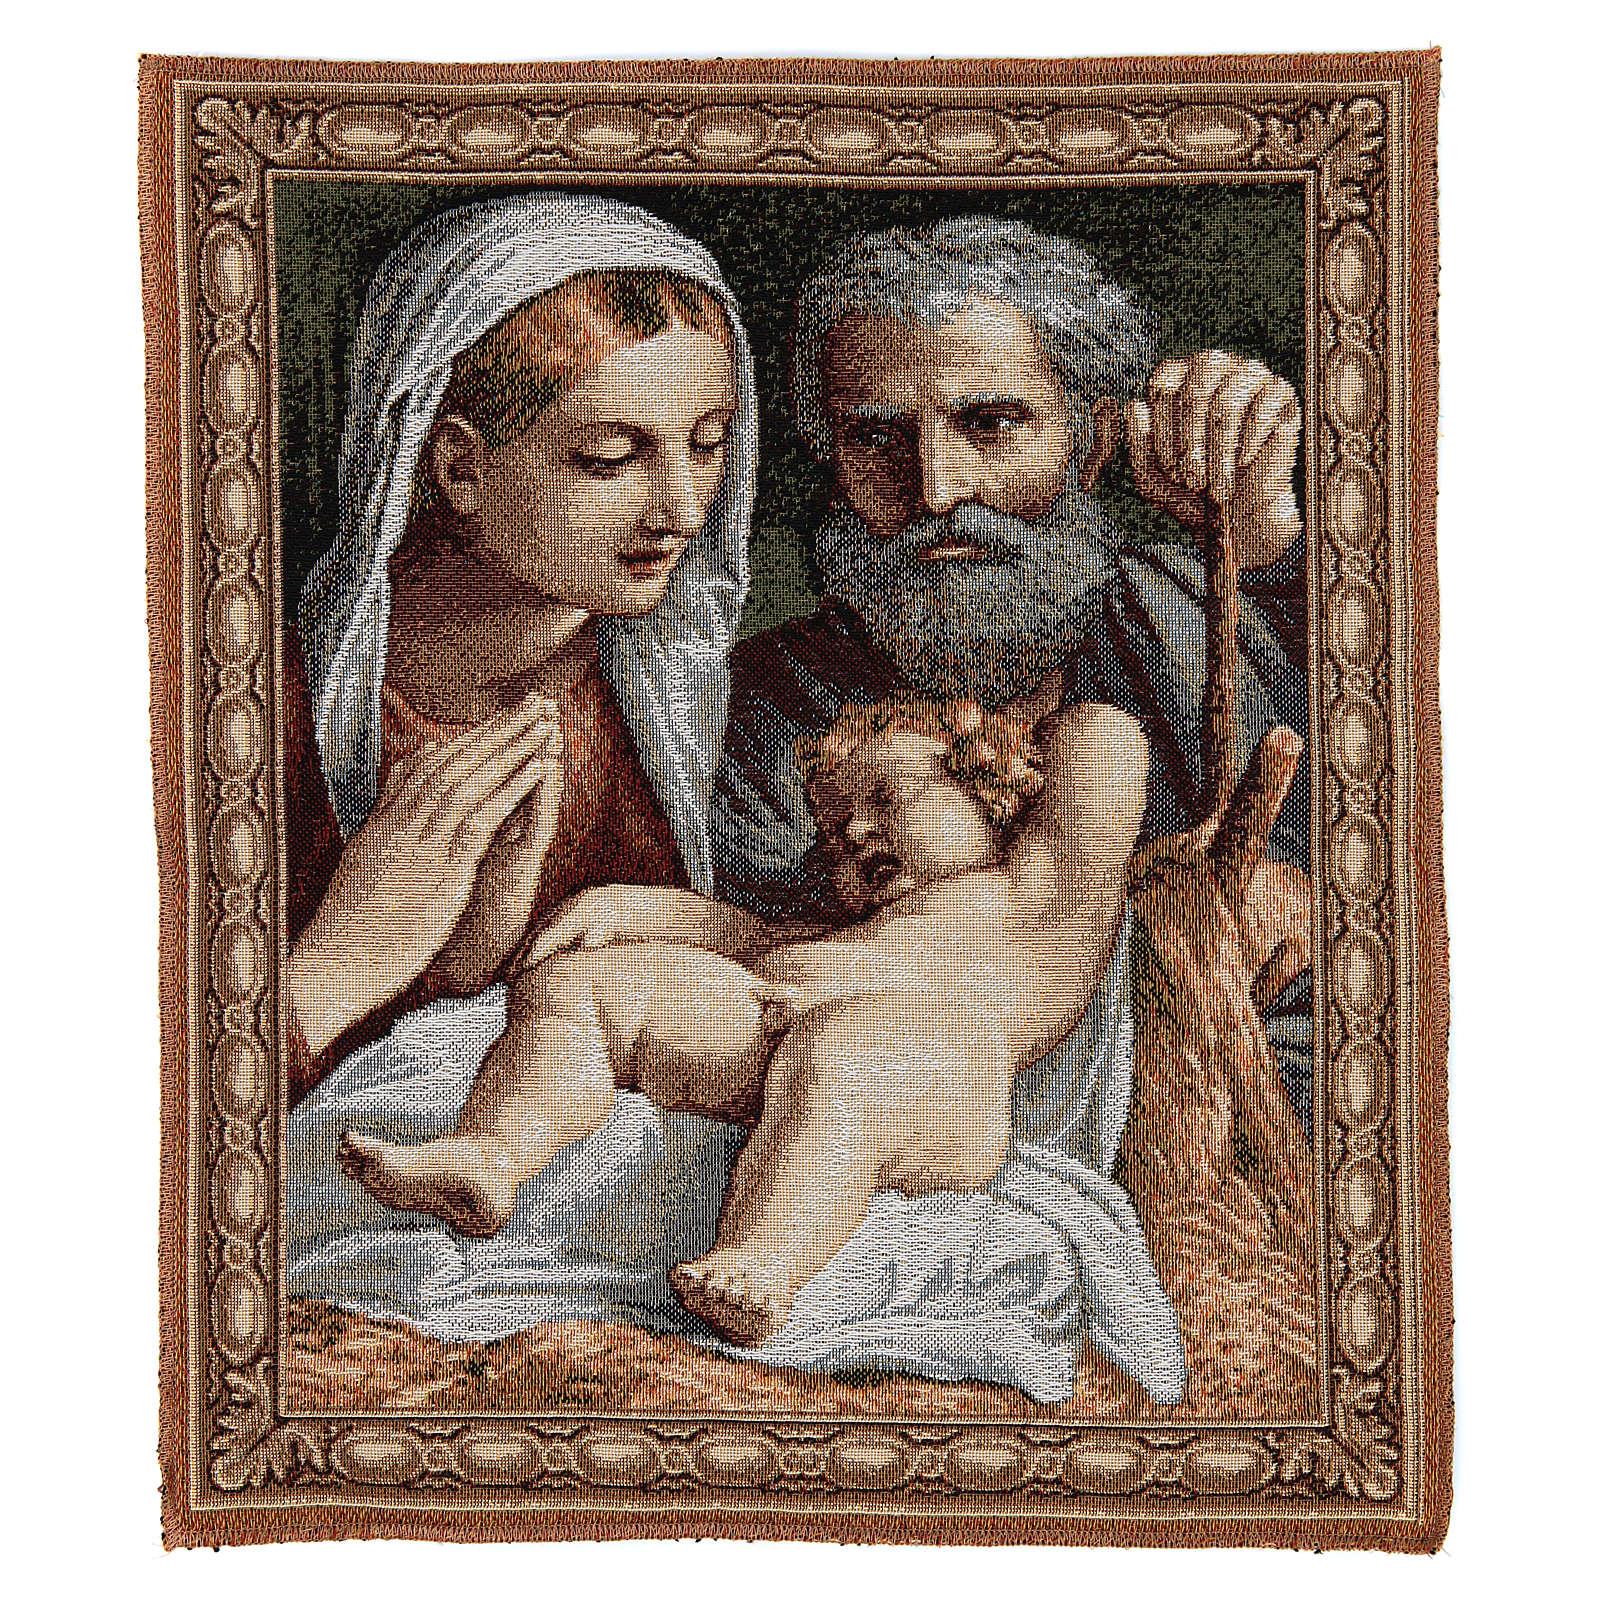 Tapeçaria Sagrada Família de Carracci 41x34 cm 3